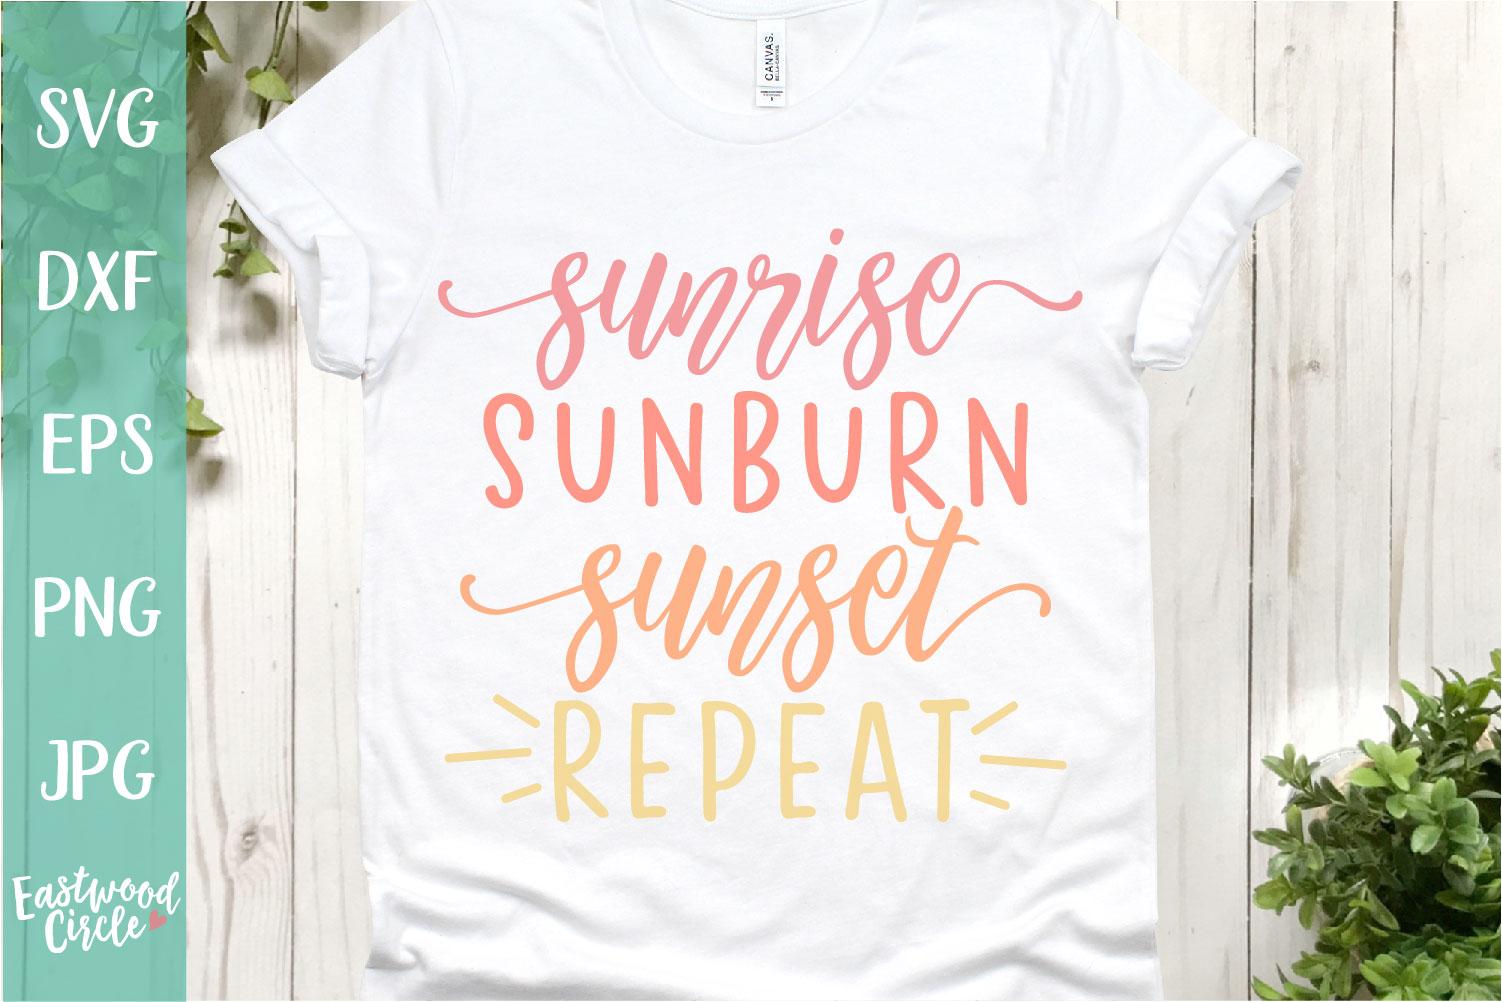 Sunrise Sunburn Sunset Repeat - A Beach SVG Cut File example image 1